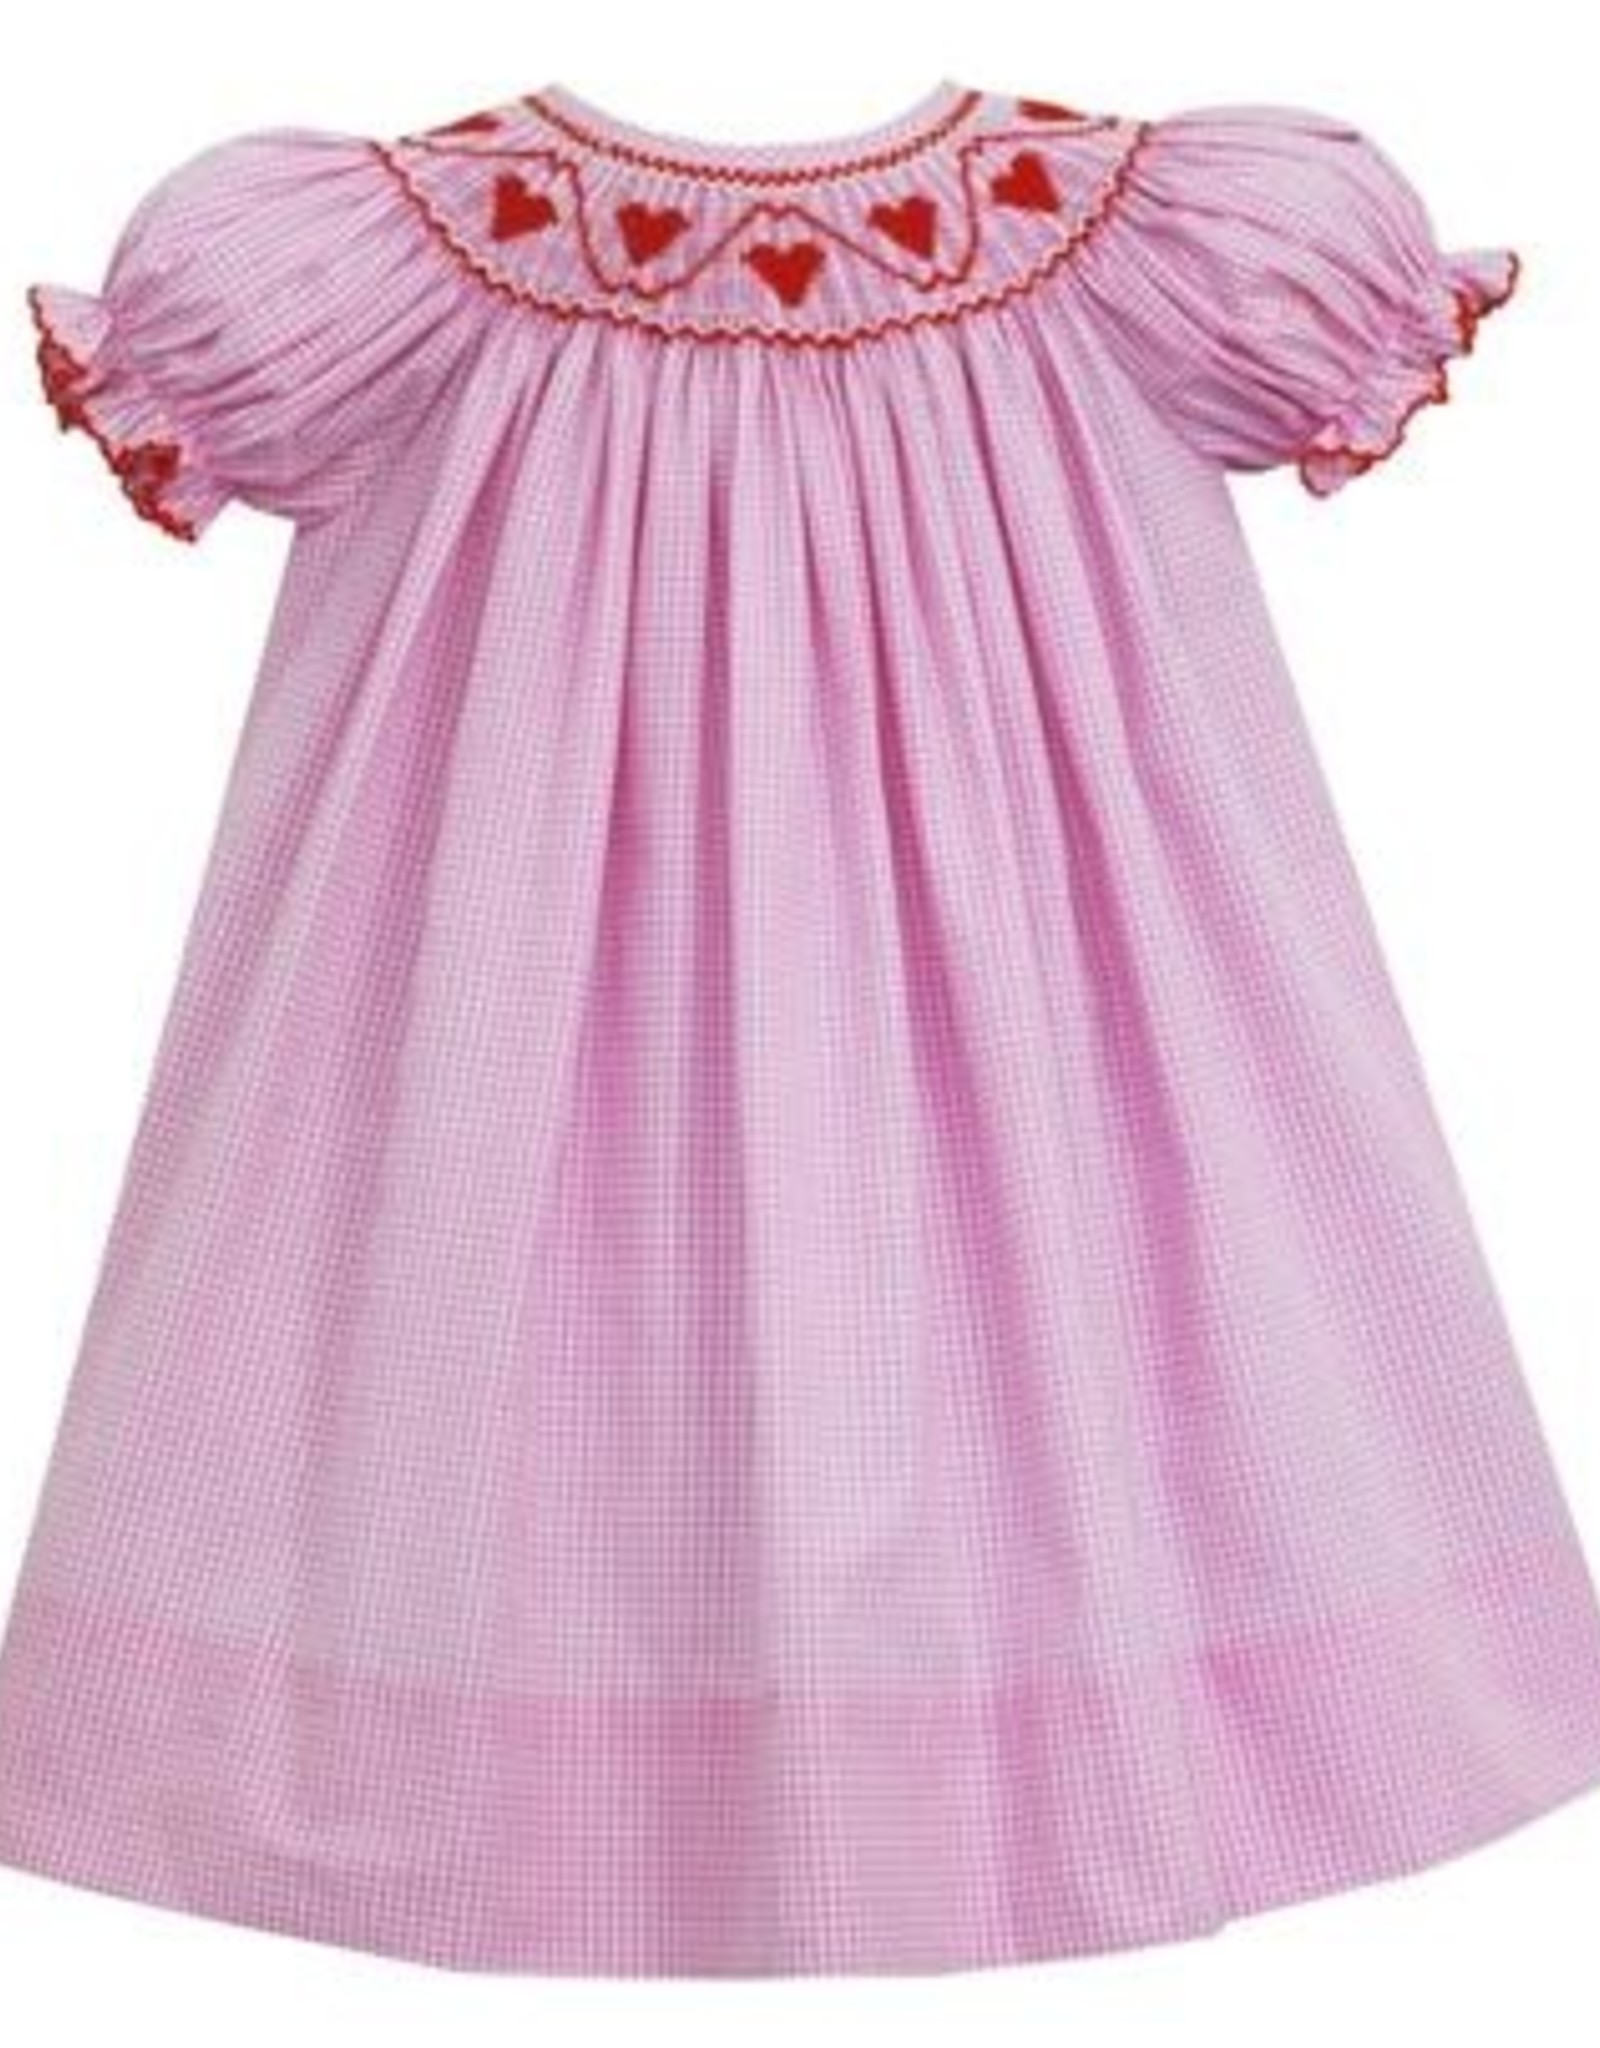 Petit Bebe Hearts Bishop Pink Mini Check